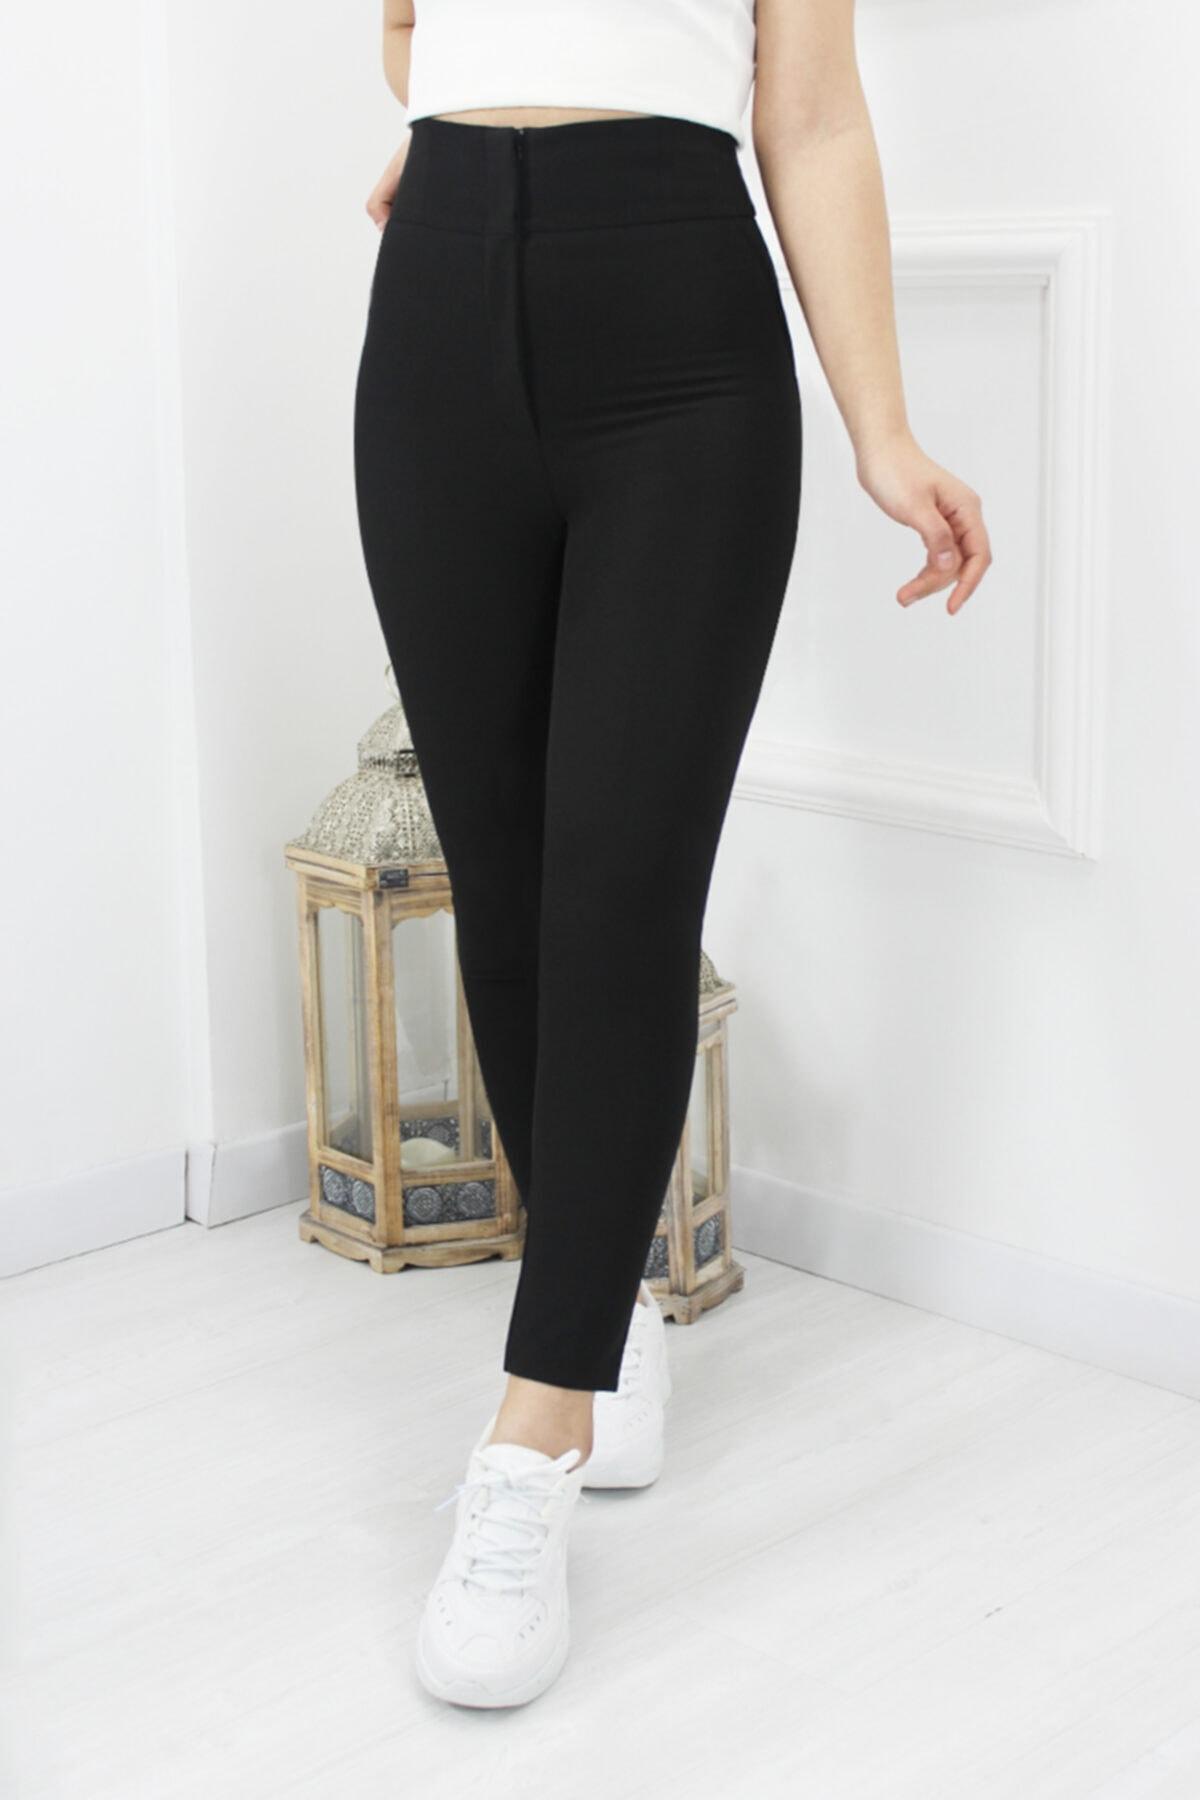 UGİMPOL Yüksek Bel Kumaş Pantolon 1